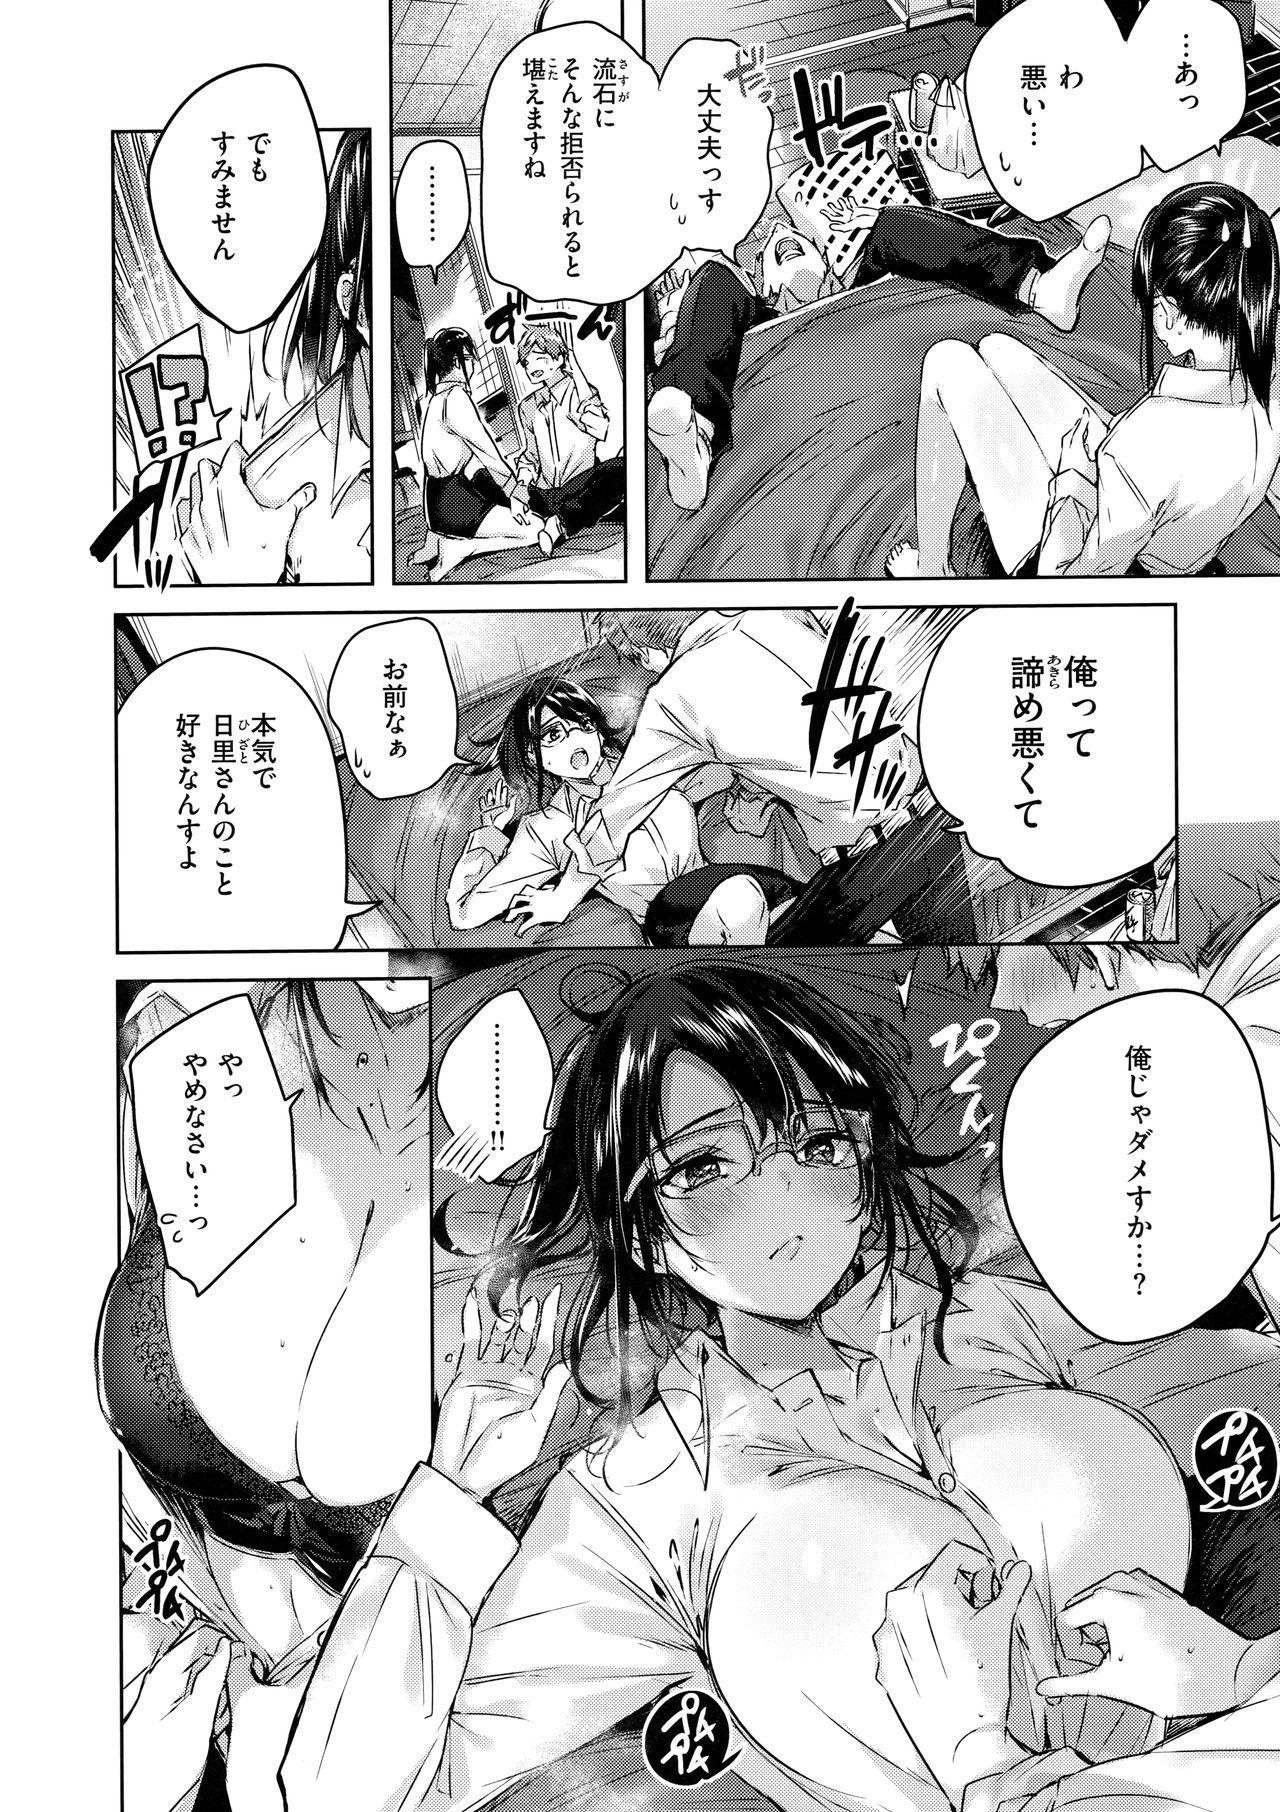 Nakadashi Strike! - Winning strike! 31